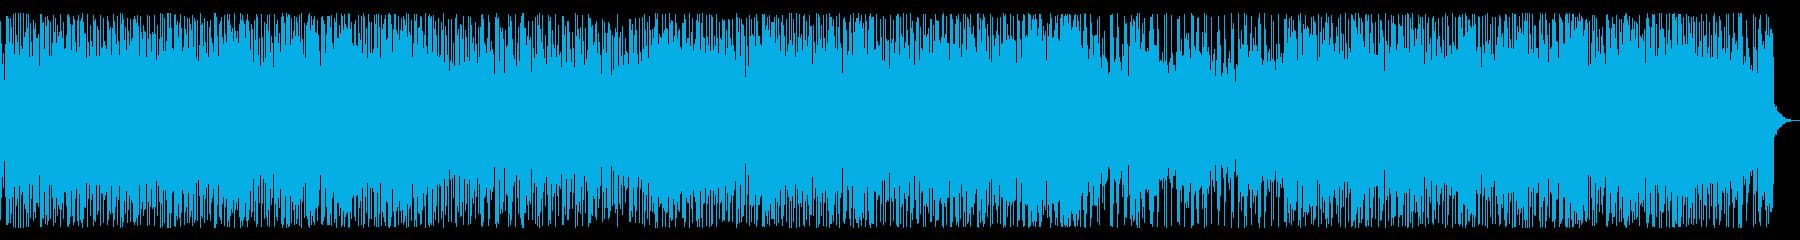 80s シンセロック・アウトラン・追跡の再生済みの波形